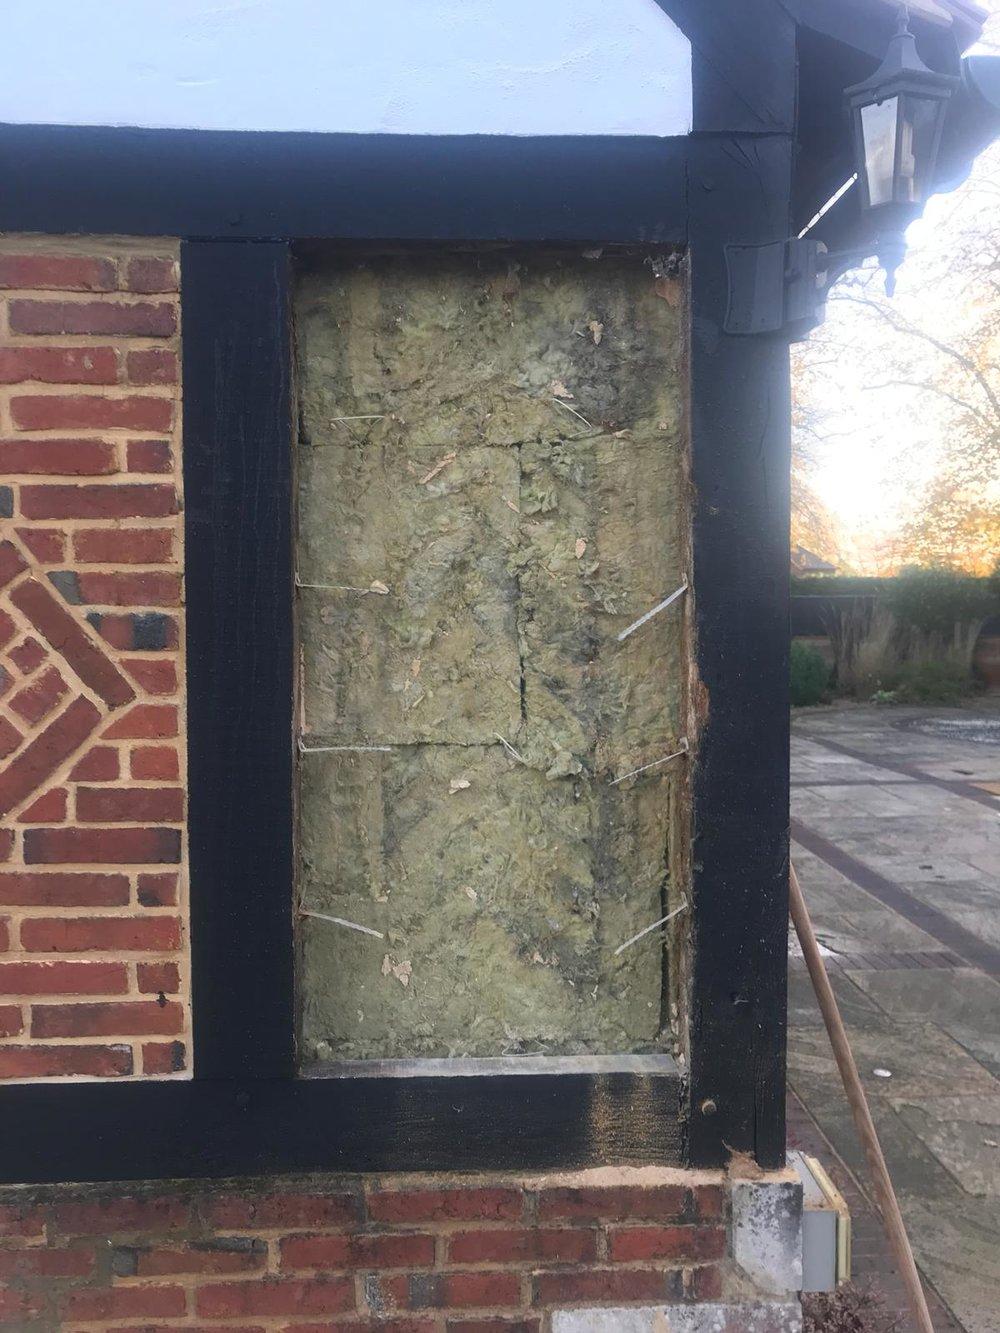 Brick Restoration Project 4 - During